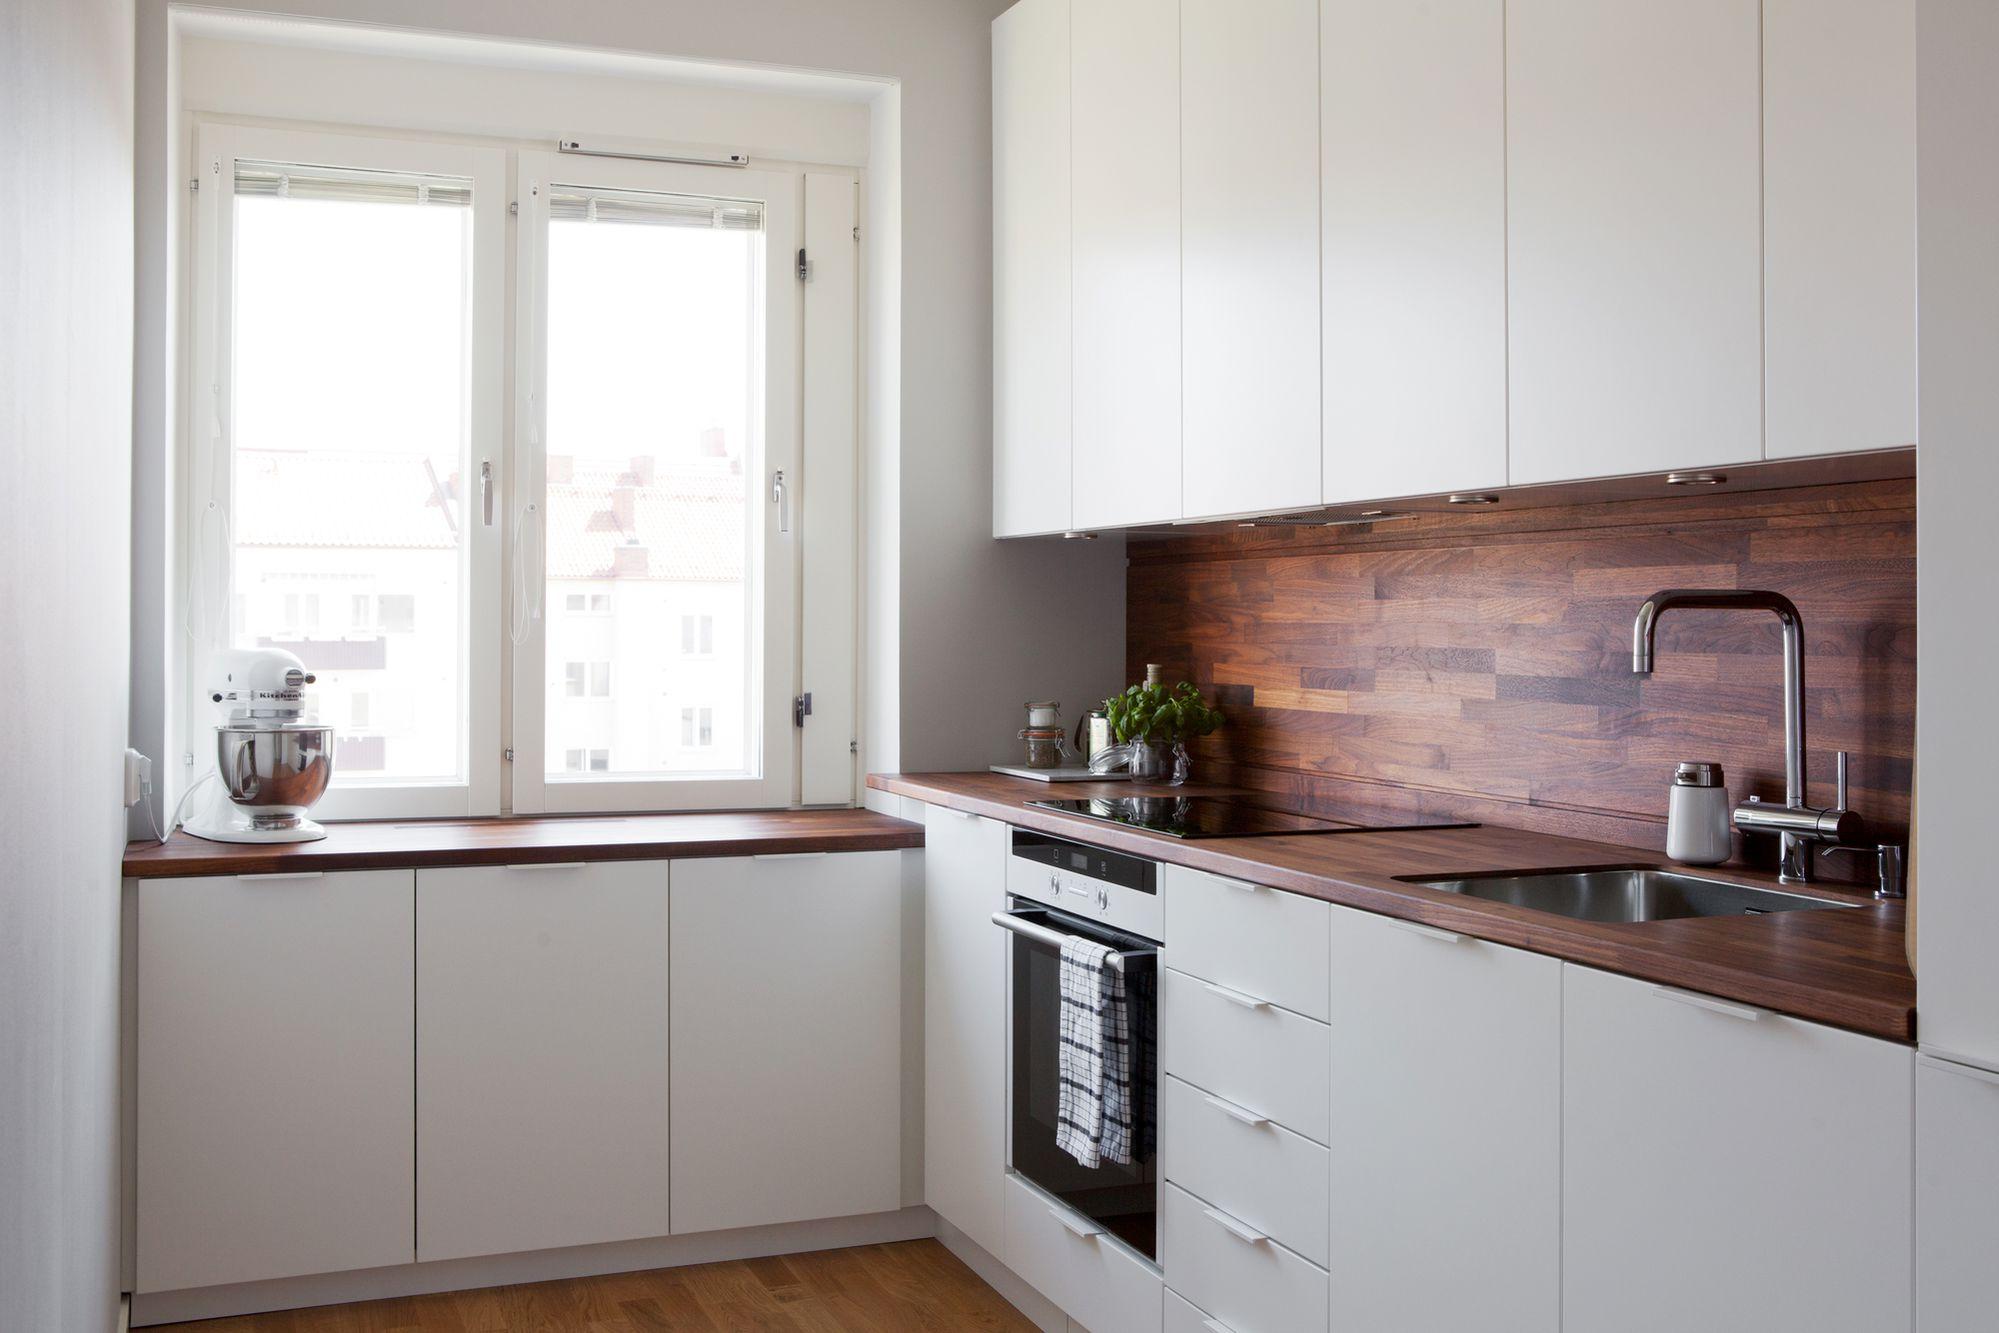 Cocina blanca con revestimiento de madera oscura blog - Maderas para cocinas ...